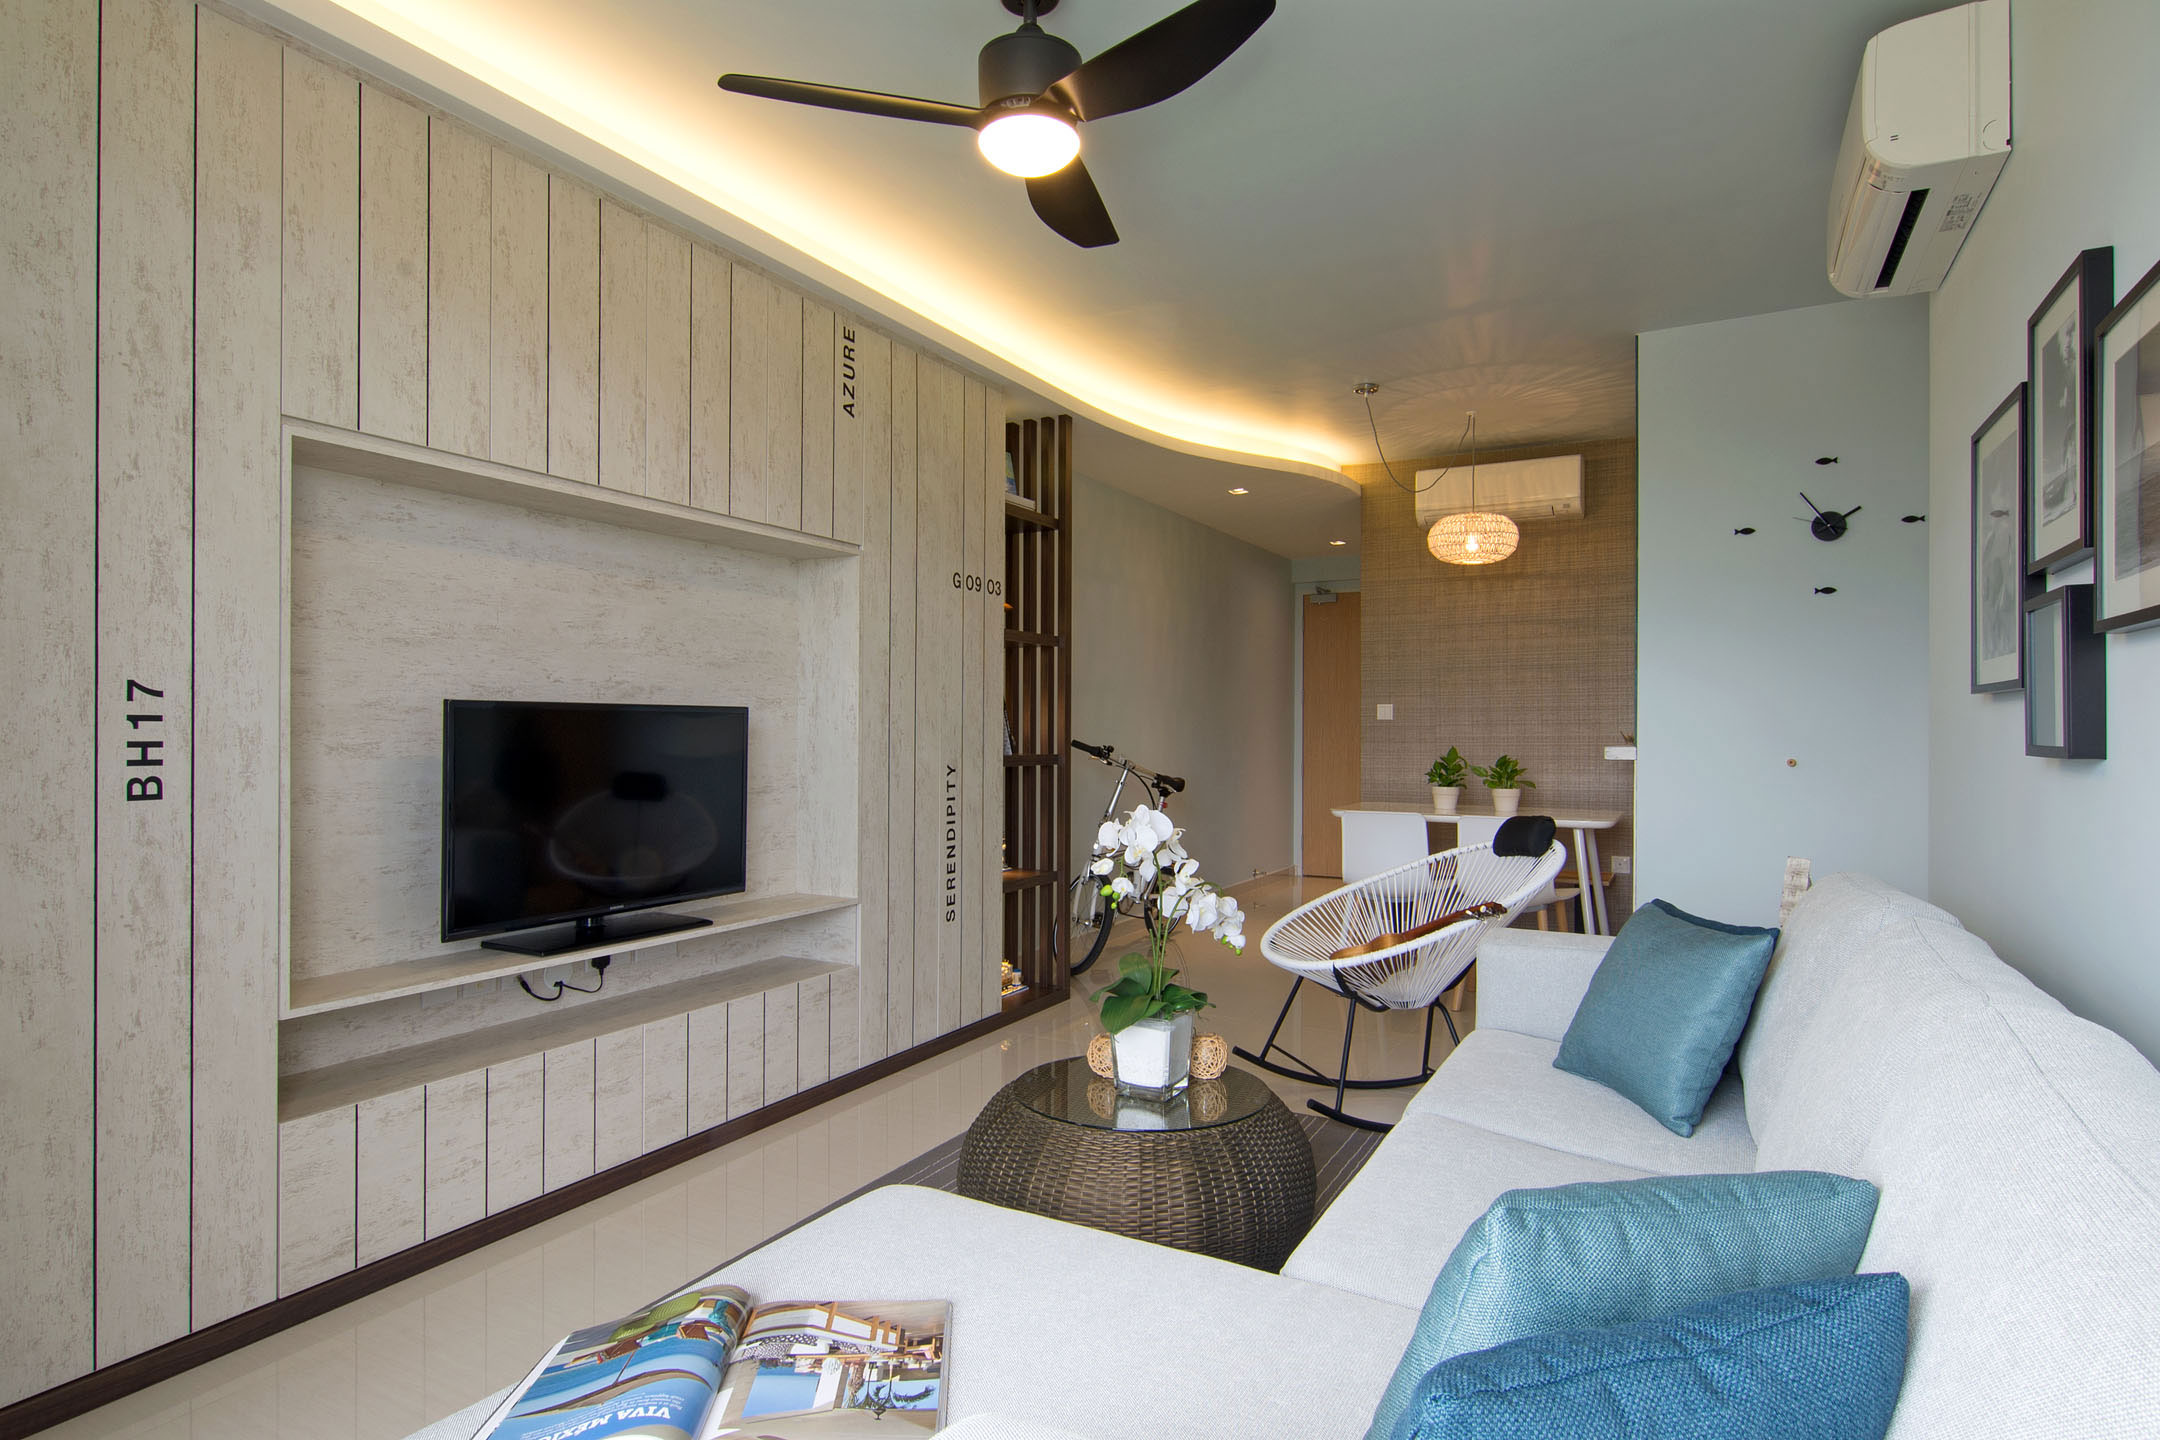 Beach house urban apartment in Singapore by Vievva Designers-09